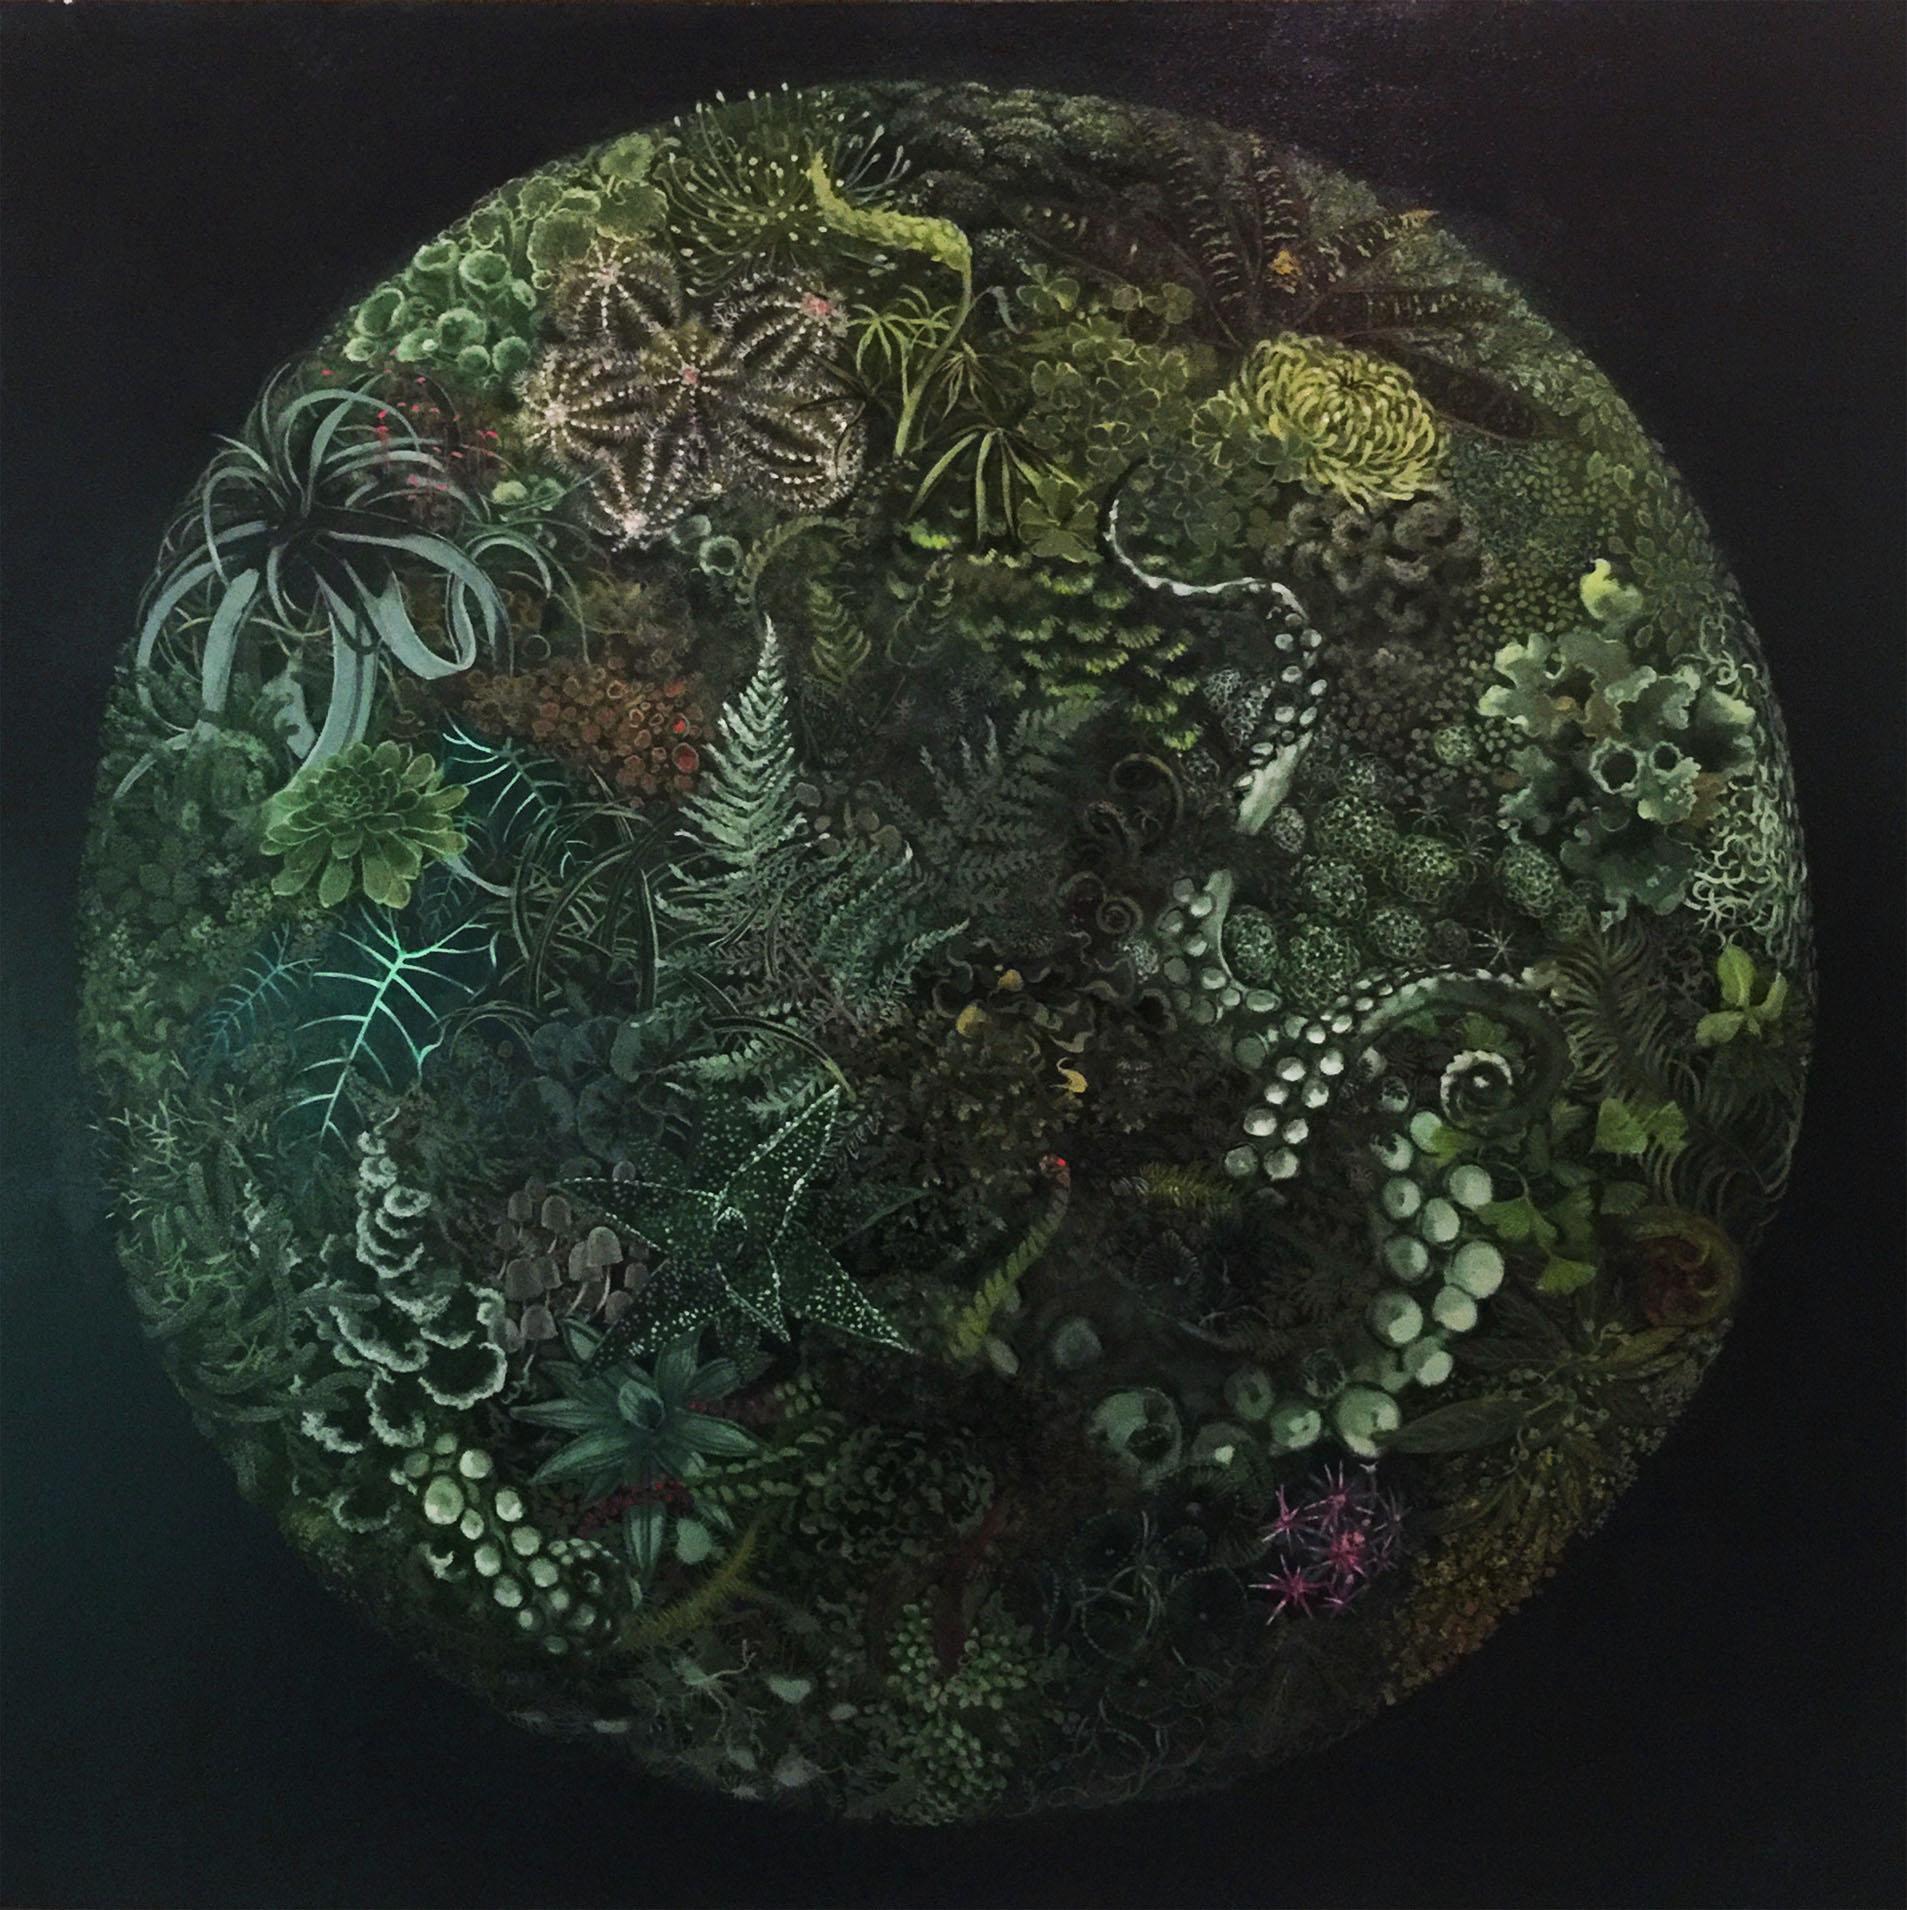 Keng Wai Lee, Serendipity, Acrylic on canvas, 102cm x102cm x 4cm,  http://www.bagmanandrobinart.co.uk